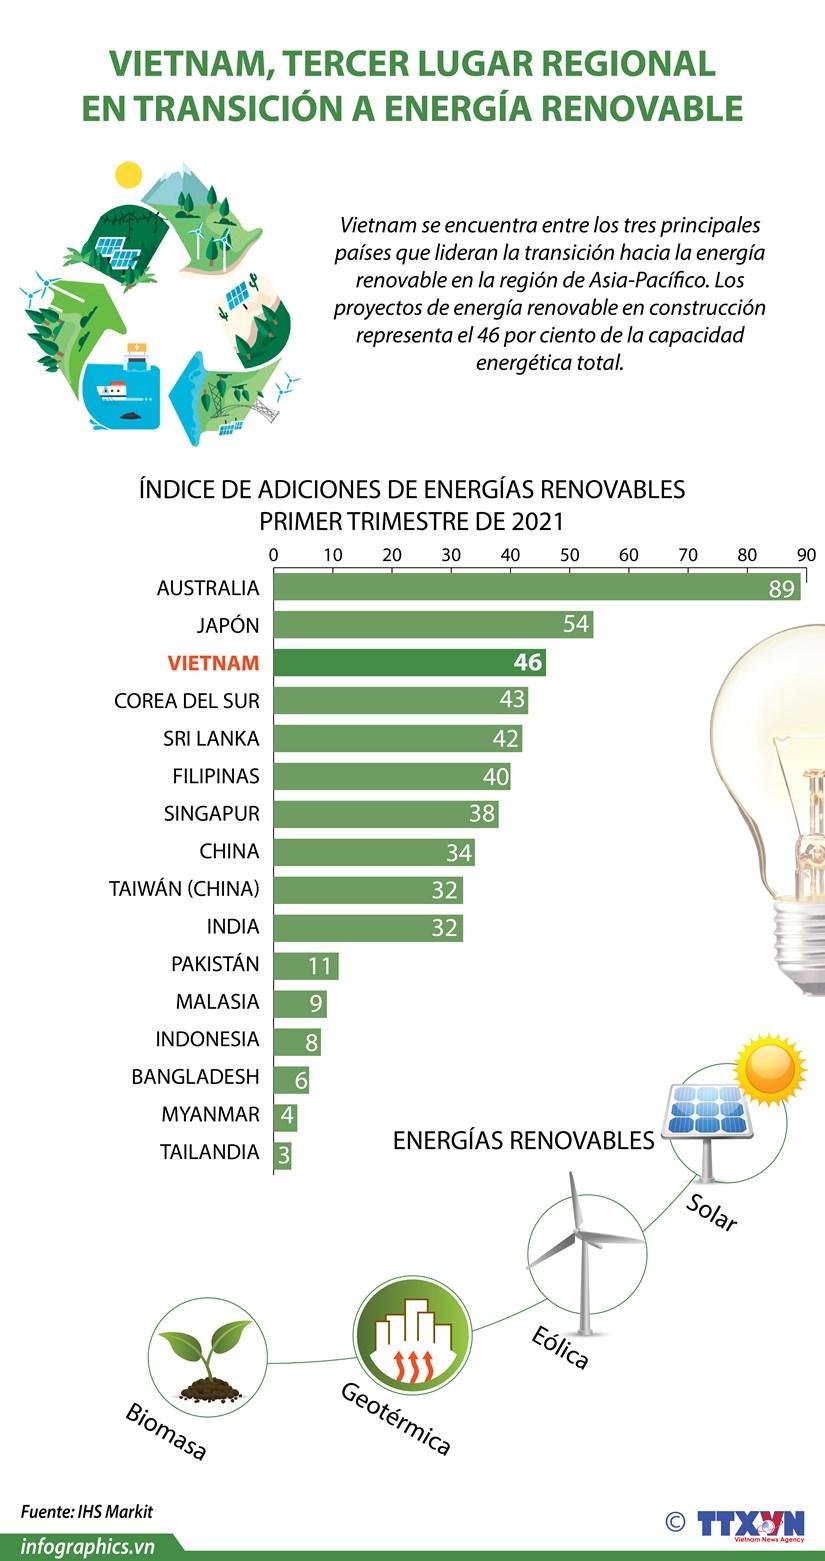 Vietnam, tercer lugar regional en transicion a energia renovable hinh anh 1